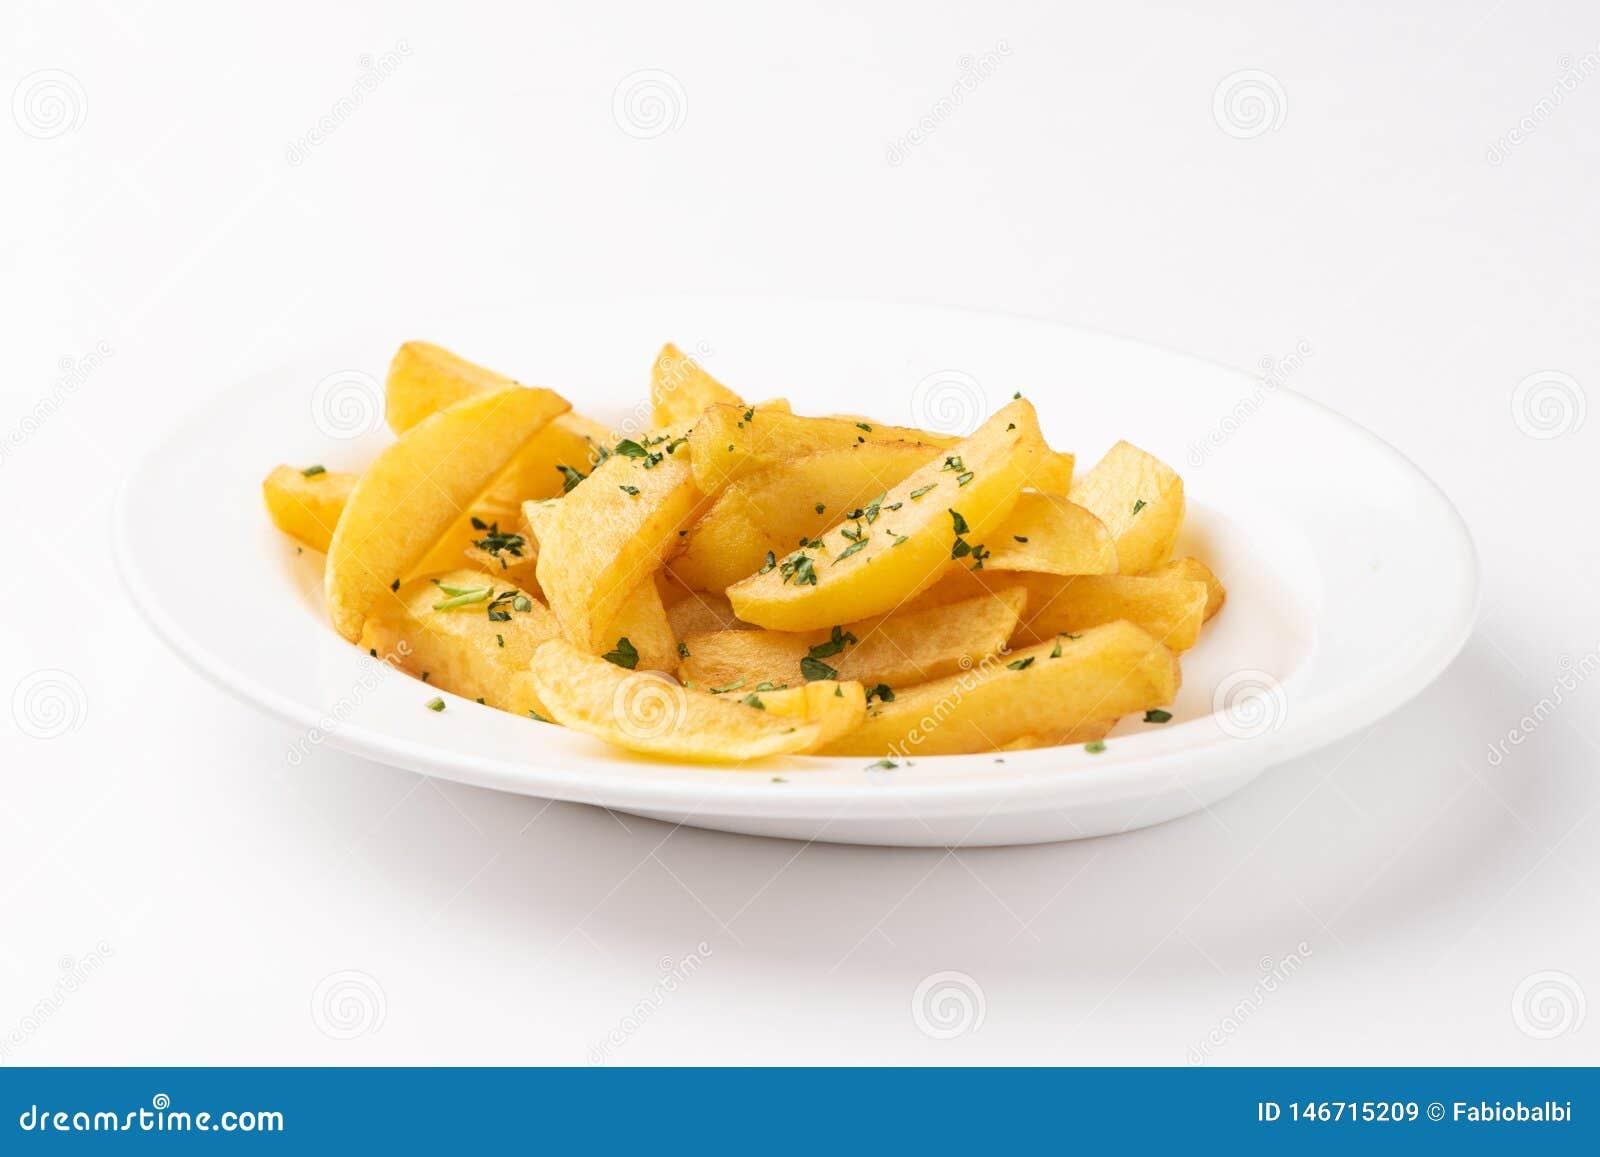 Fried Potato French Fries savoureux du plat blanc